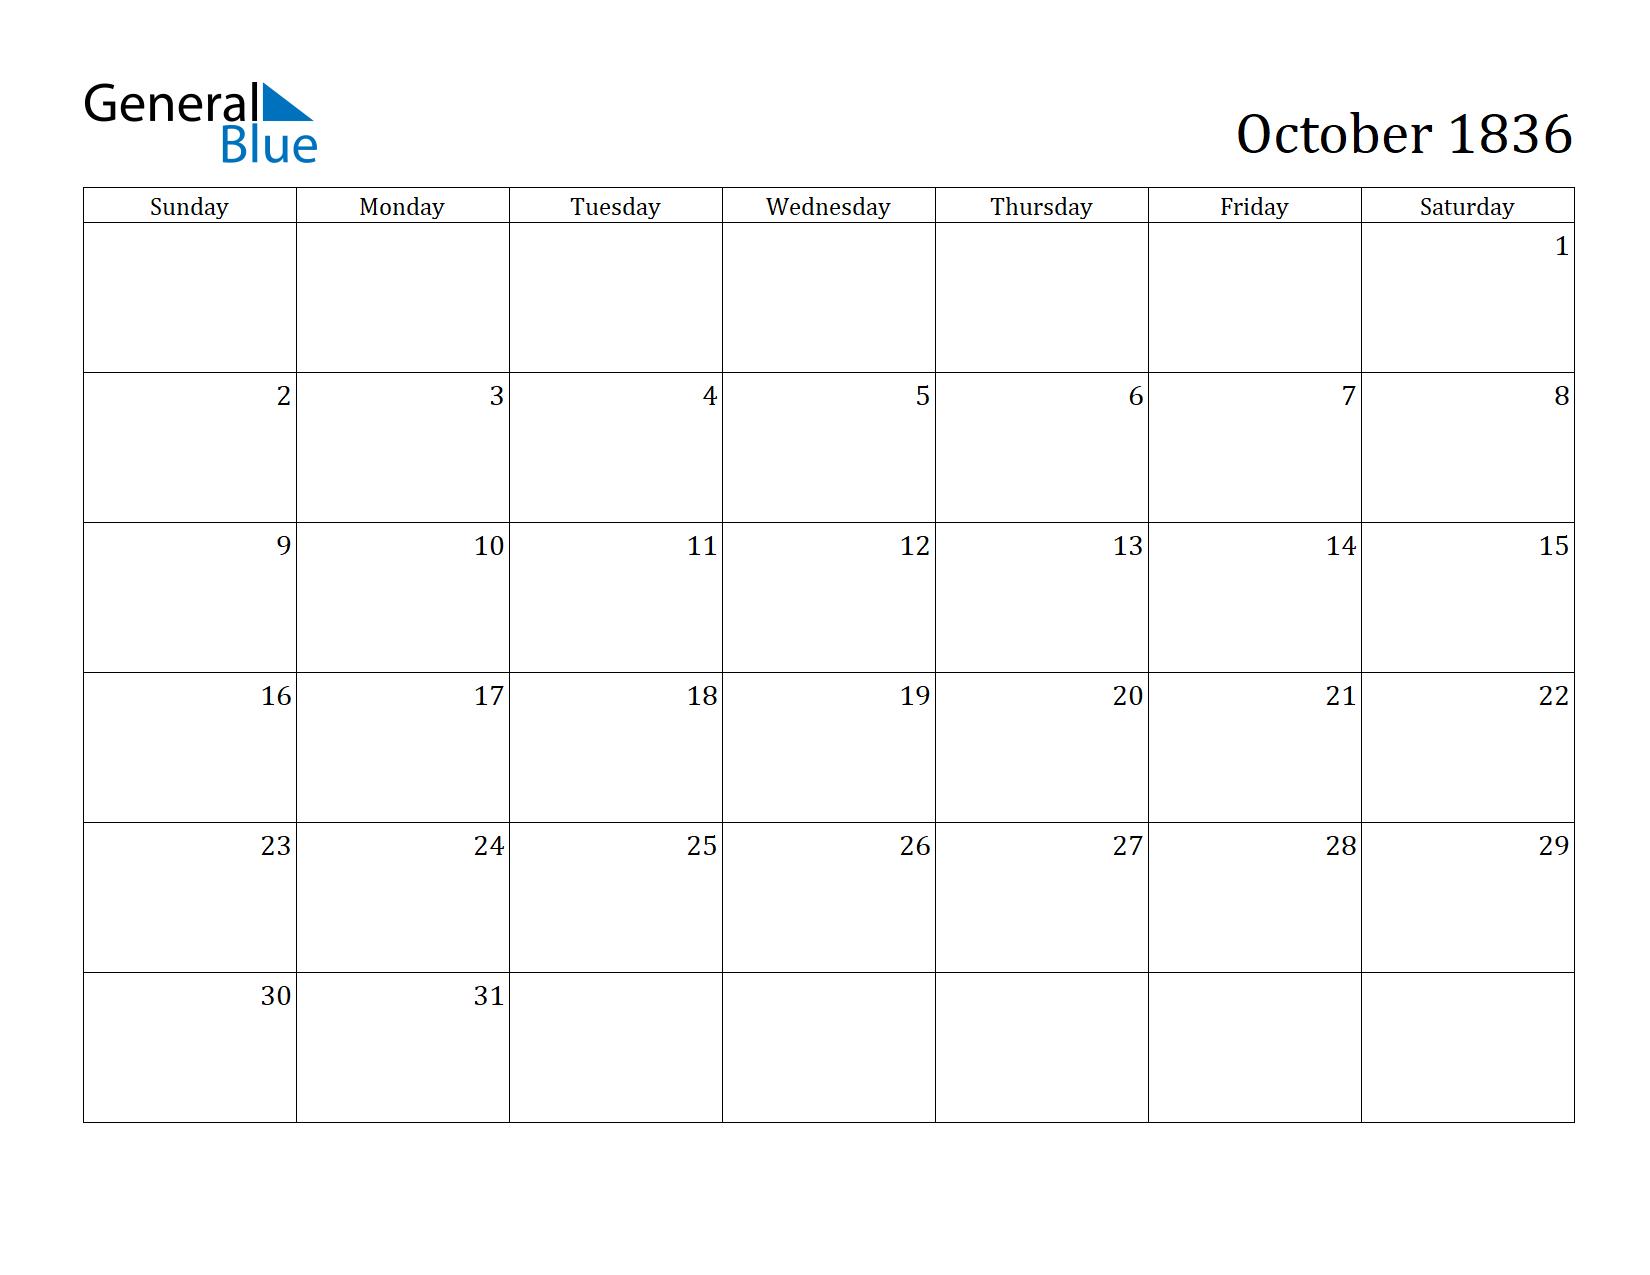 Image of October 1836 Calendar